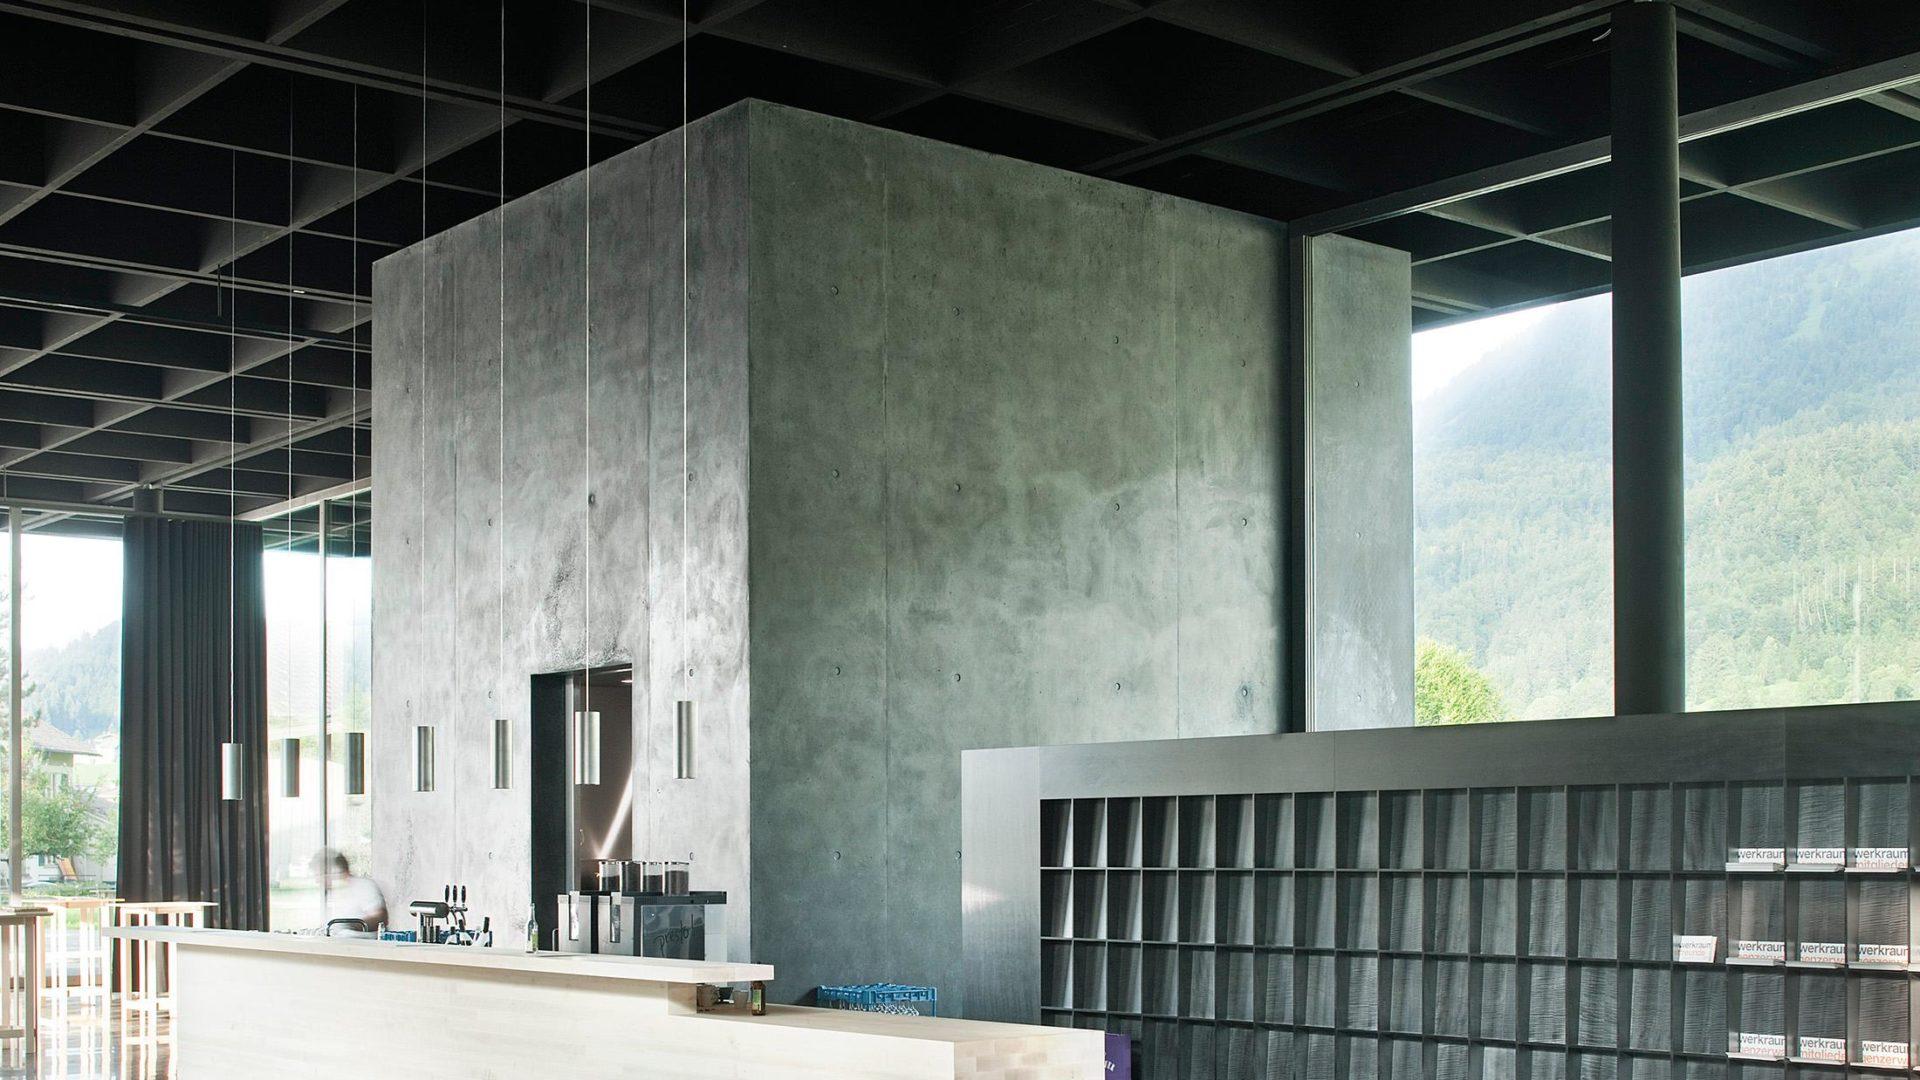 The Werkraumhaus In Andelsbuch Built By Architect Peter Zumthor